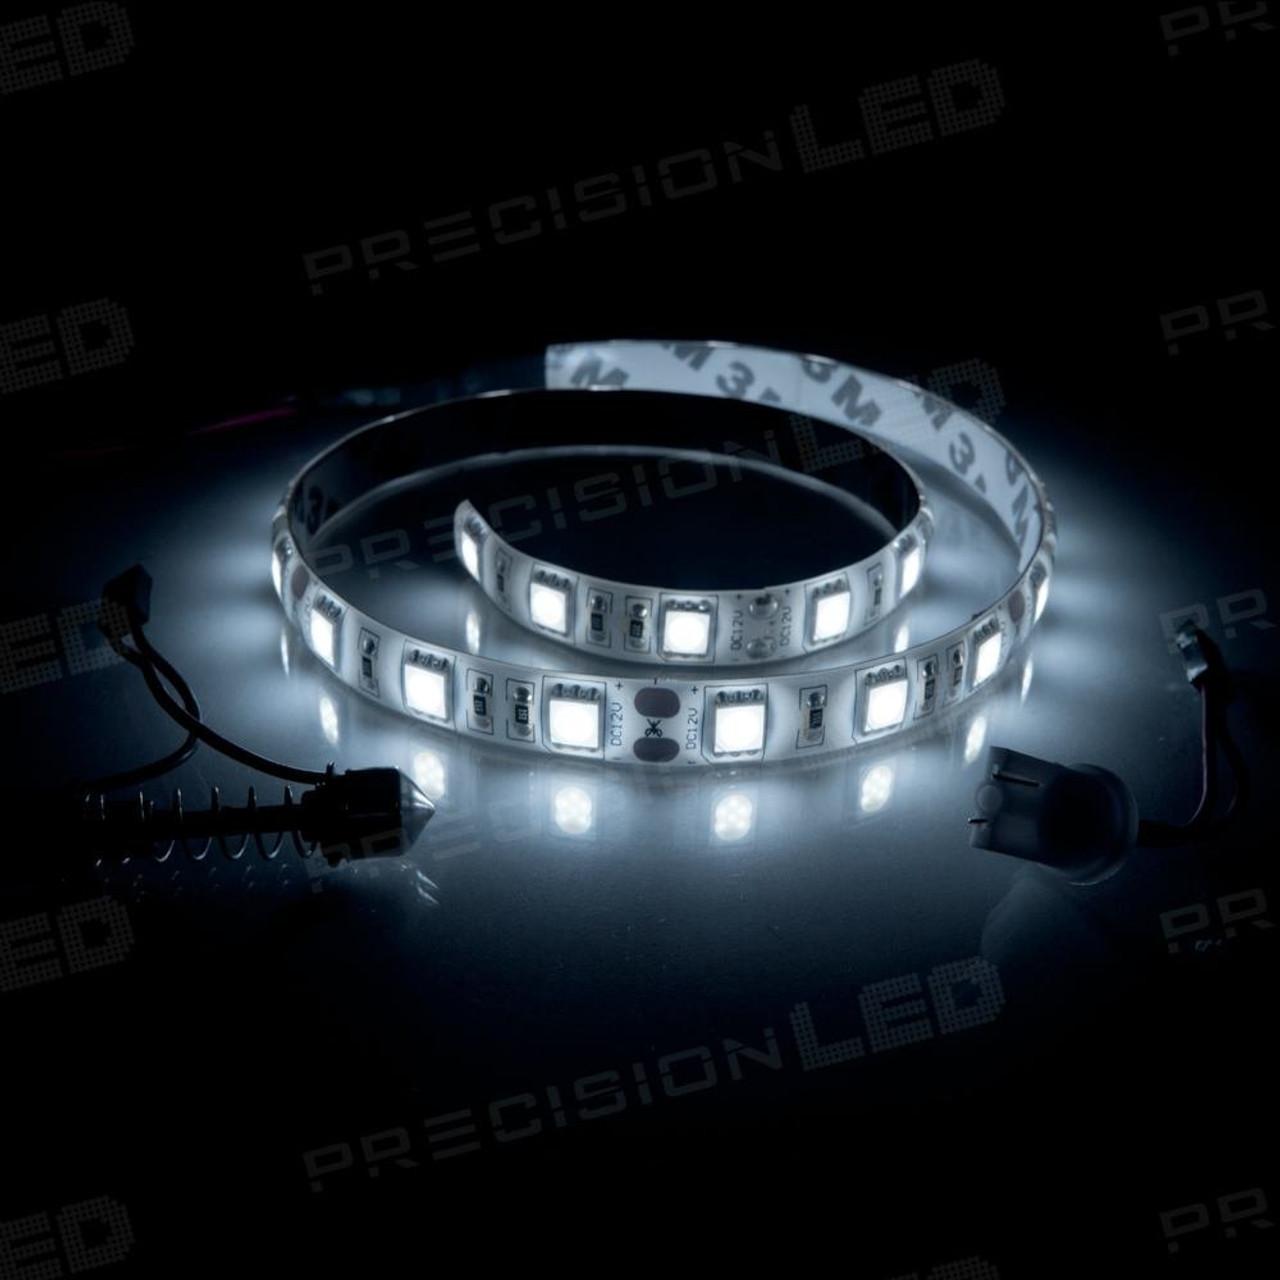 Hyundai Equus LED Trunk Strip Light (2011-Present)